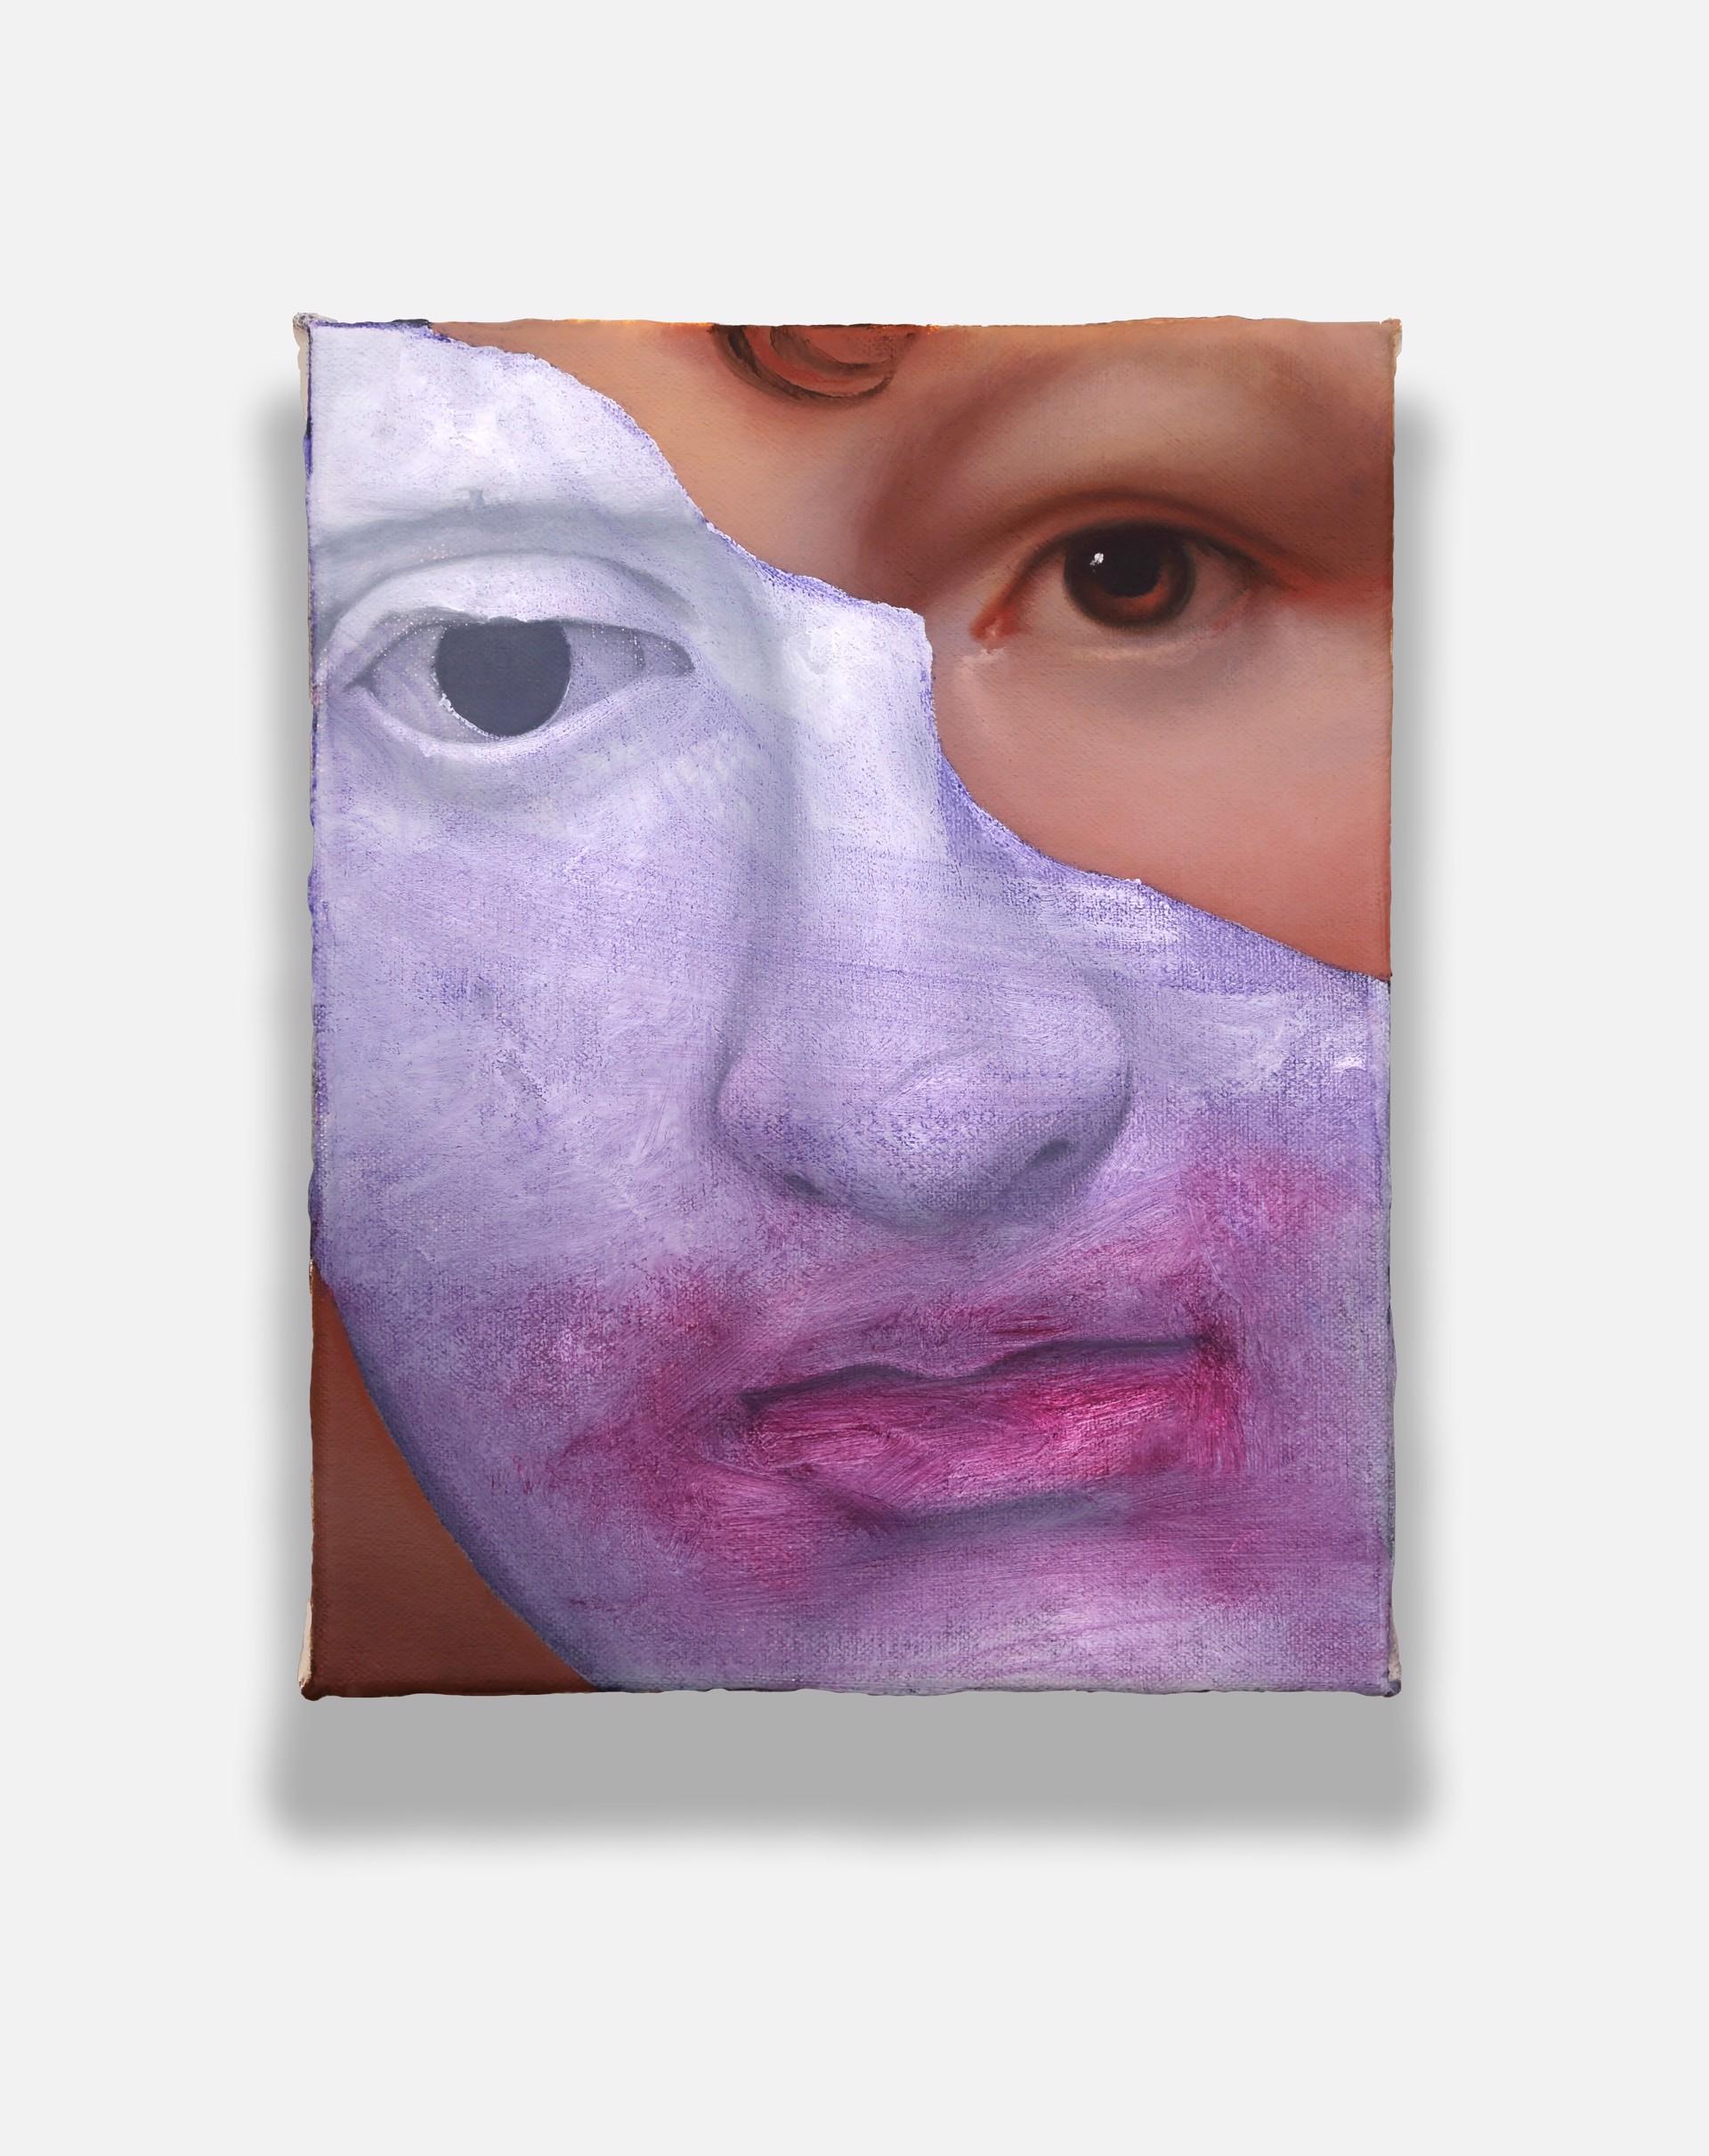 (Michael Angelo Peale) by Shawn Huckins